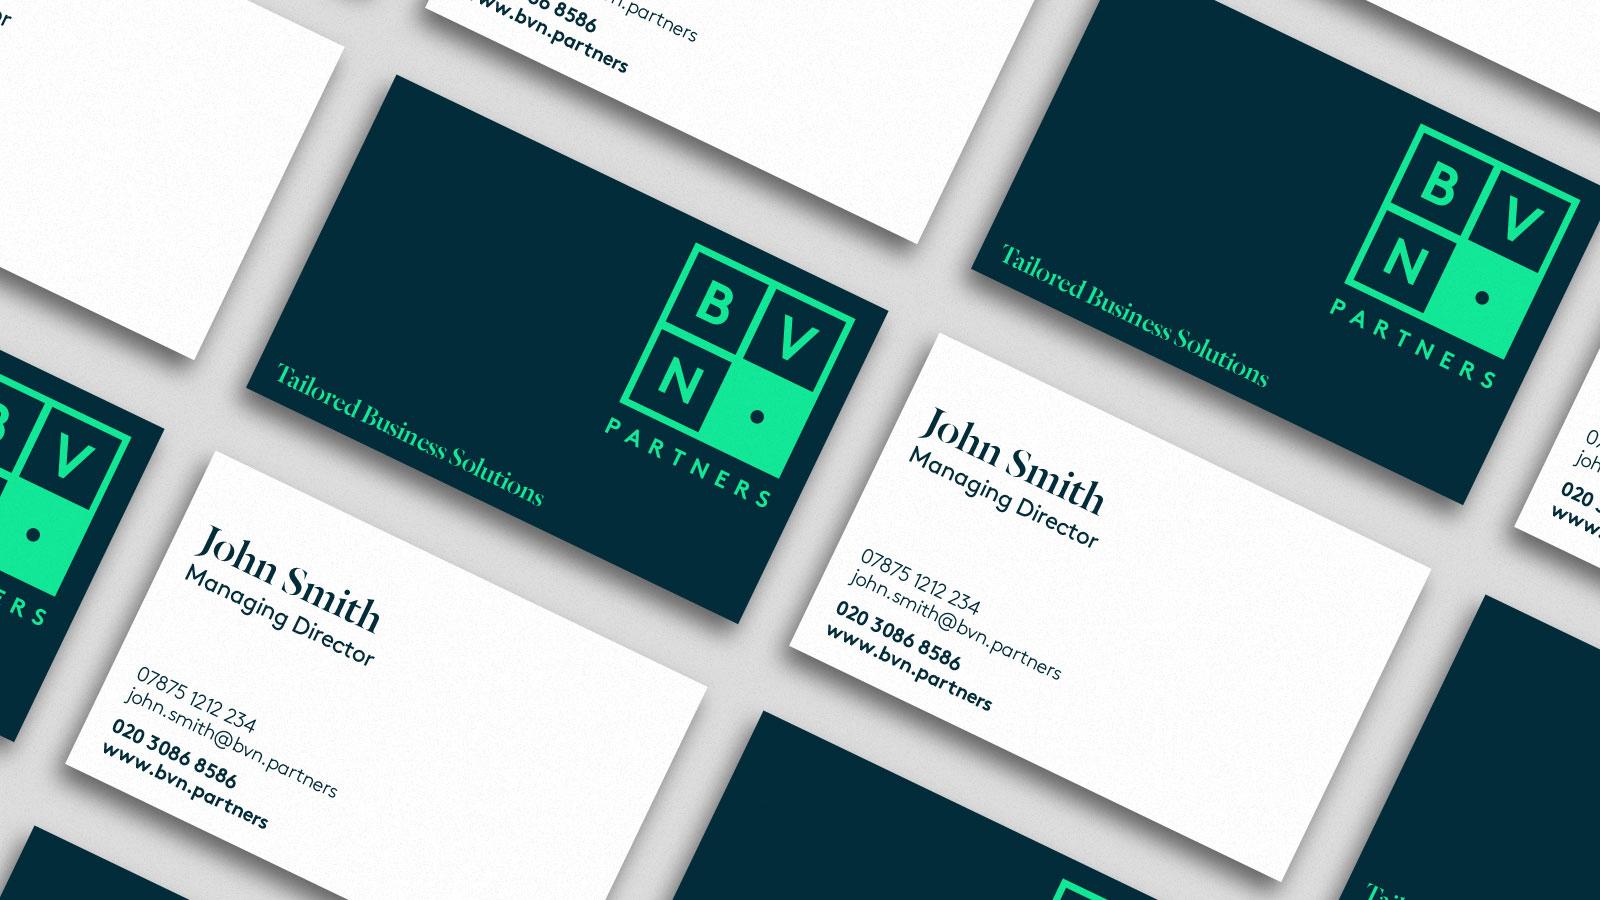 BVN-Partners-06